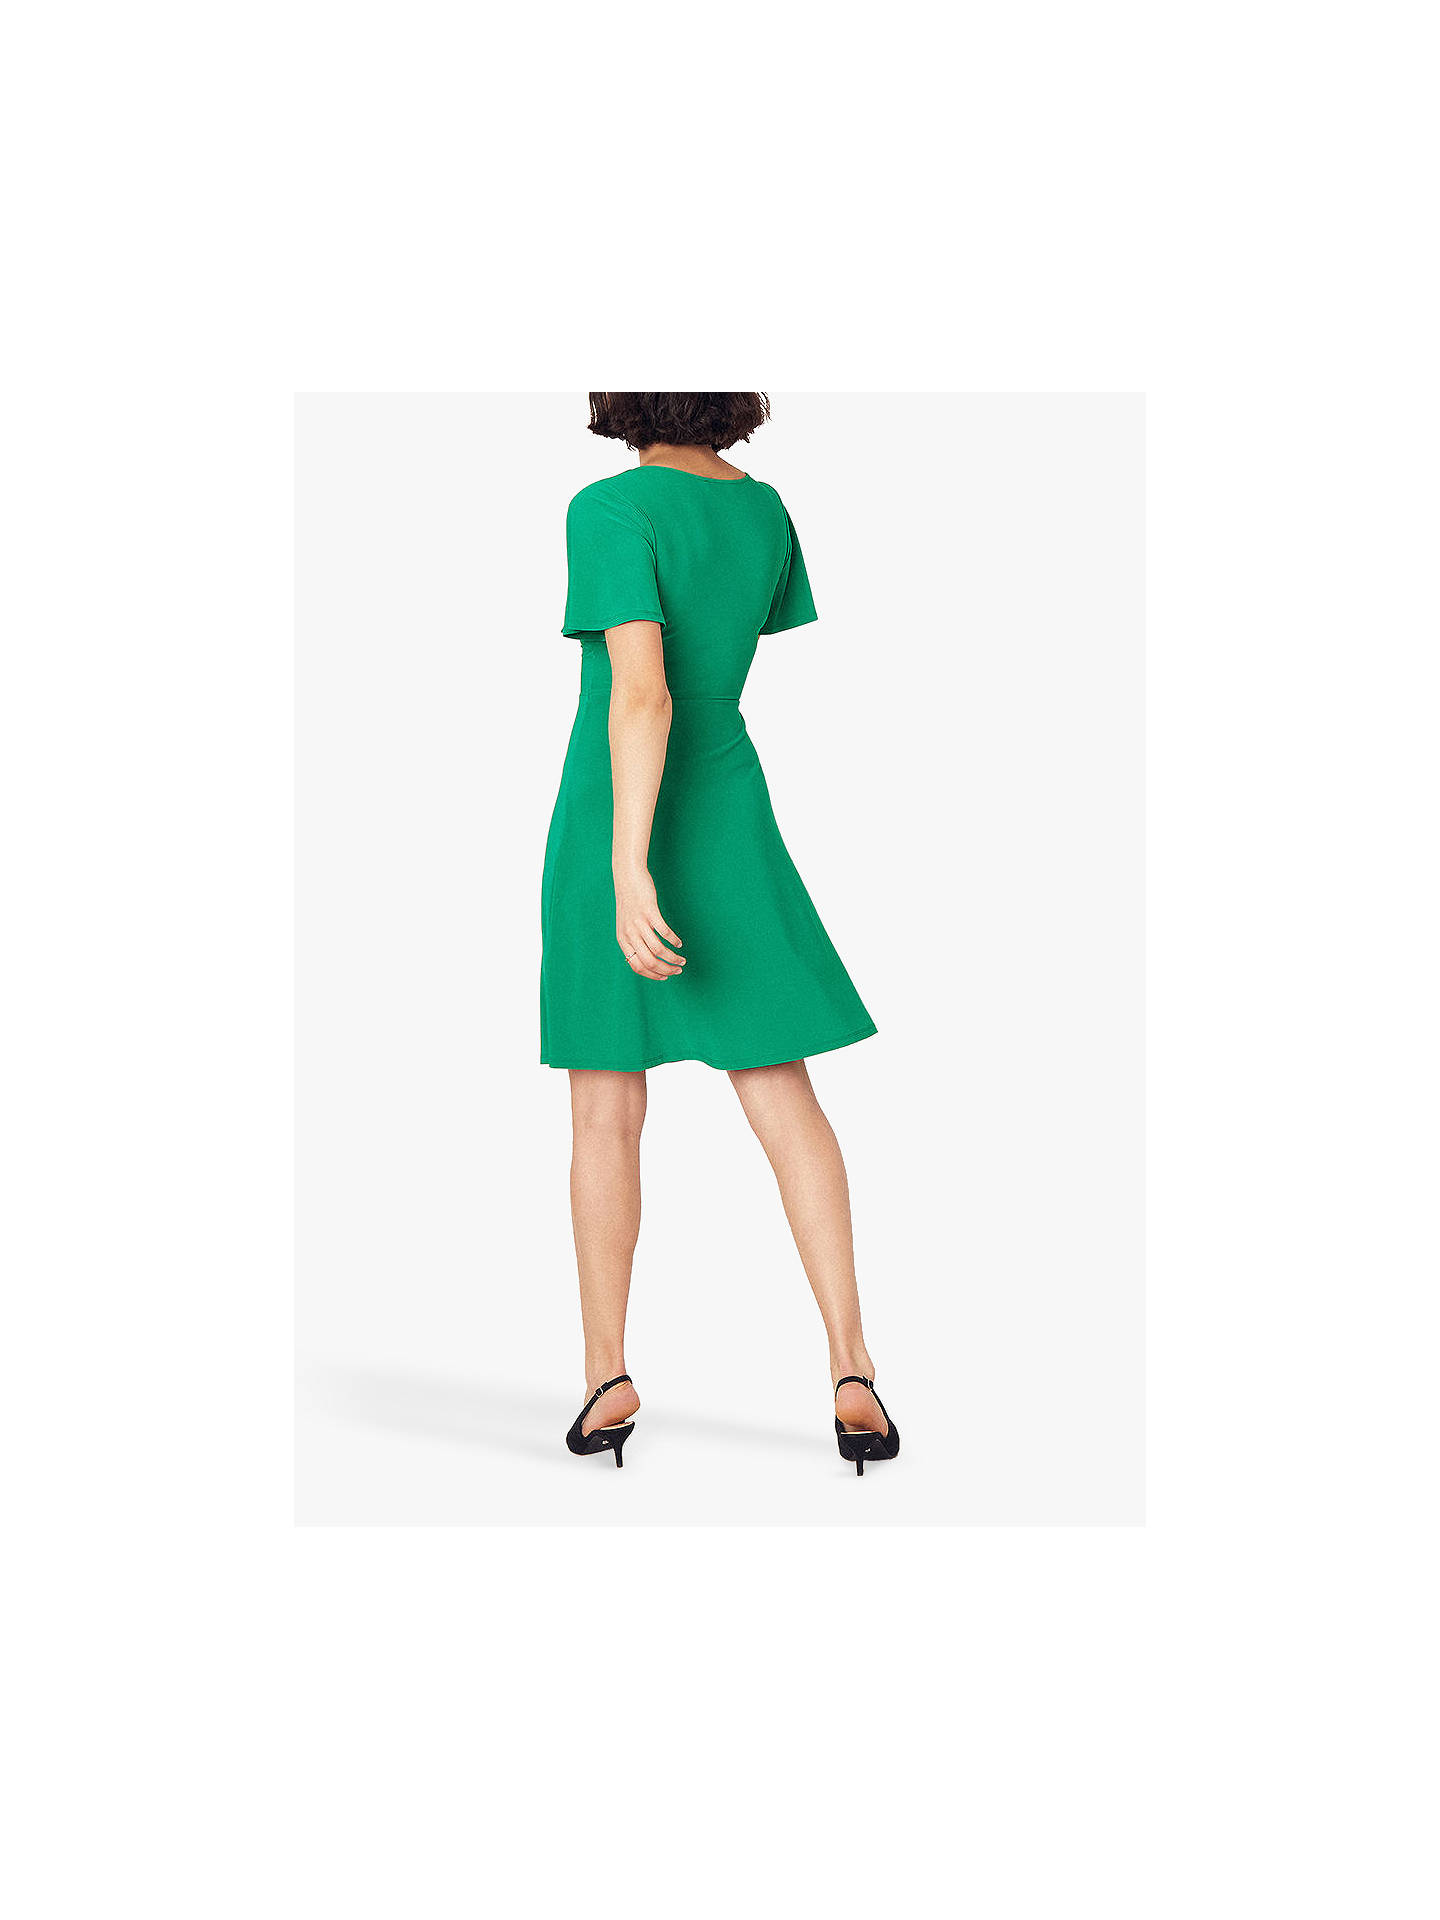 52ca009b52ff4 ... Buy Oasis Juliette Tie Front Dress, Deep Green, XS Online at  johnlewis.com ...